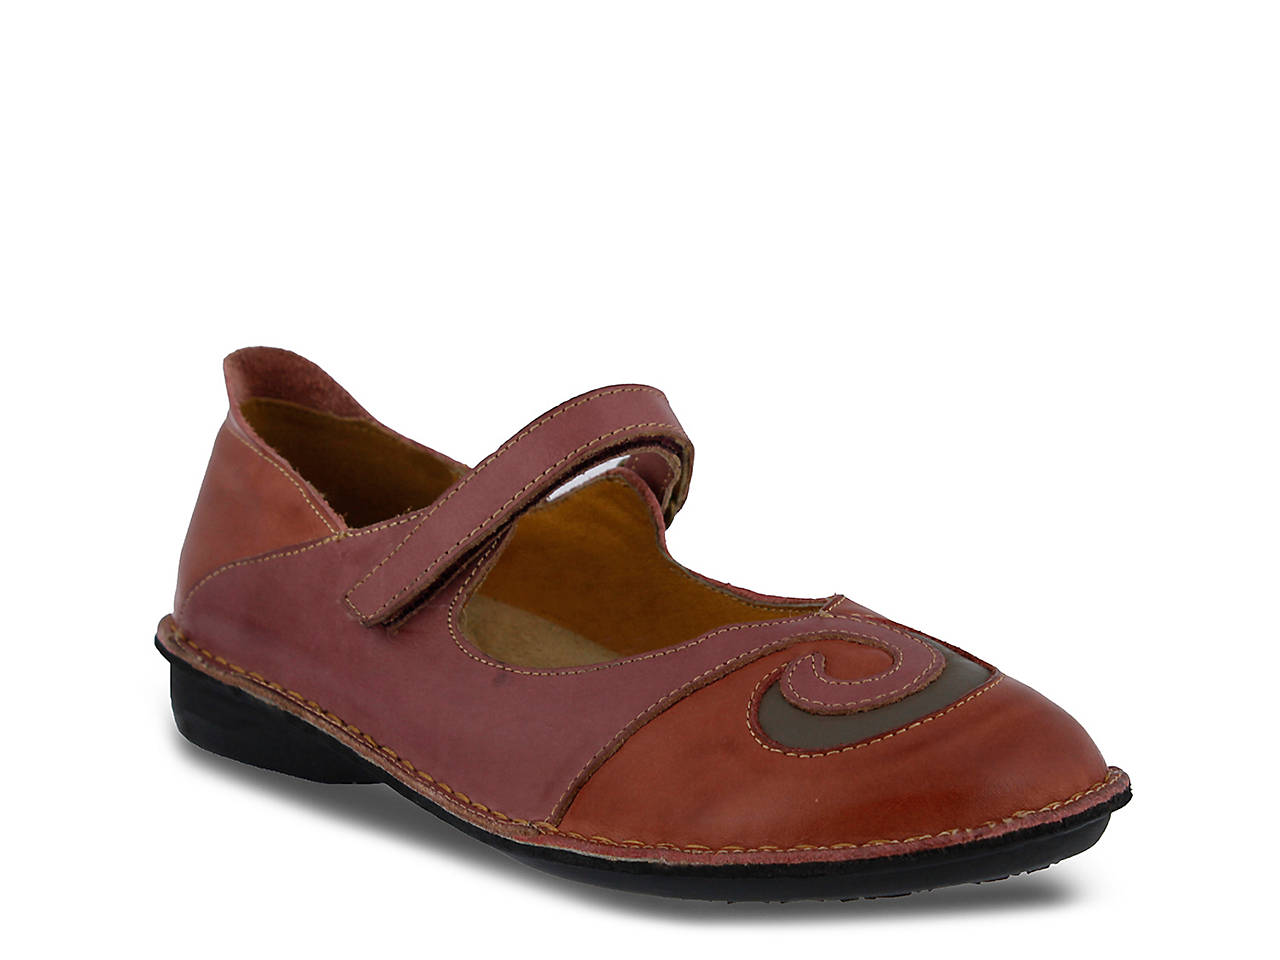 Spring Step Cosmic Women's ... Mary Jane Shoes JVNMdB